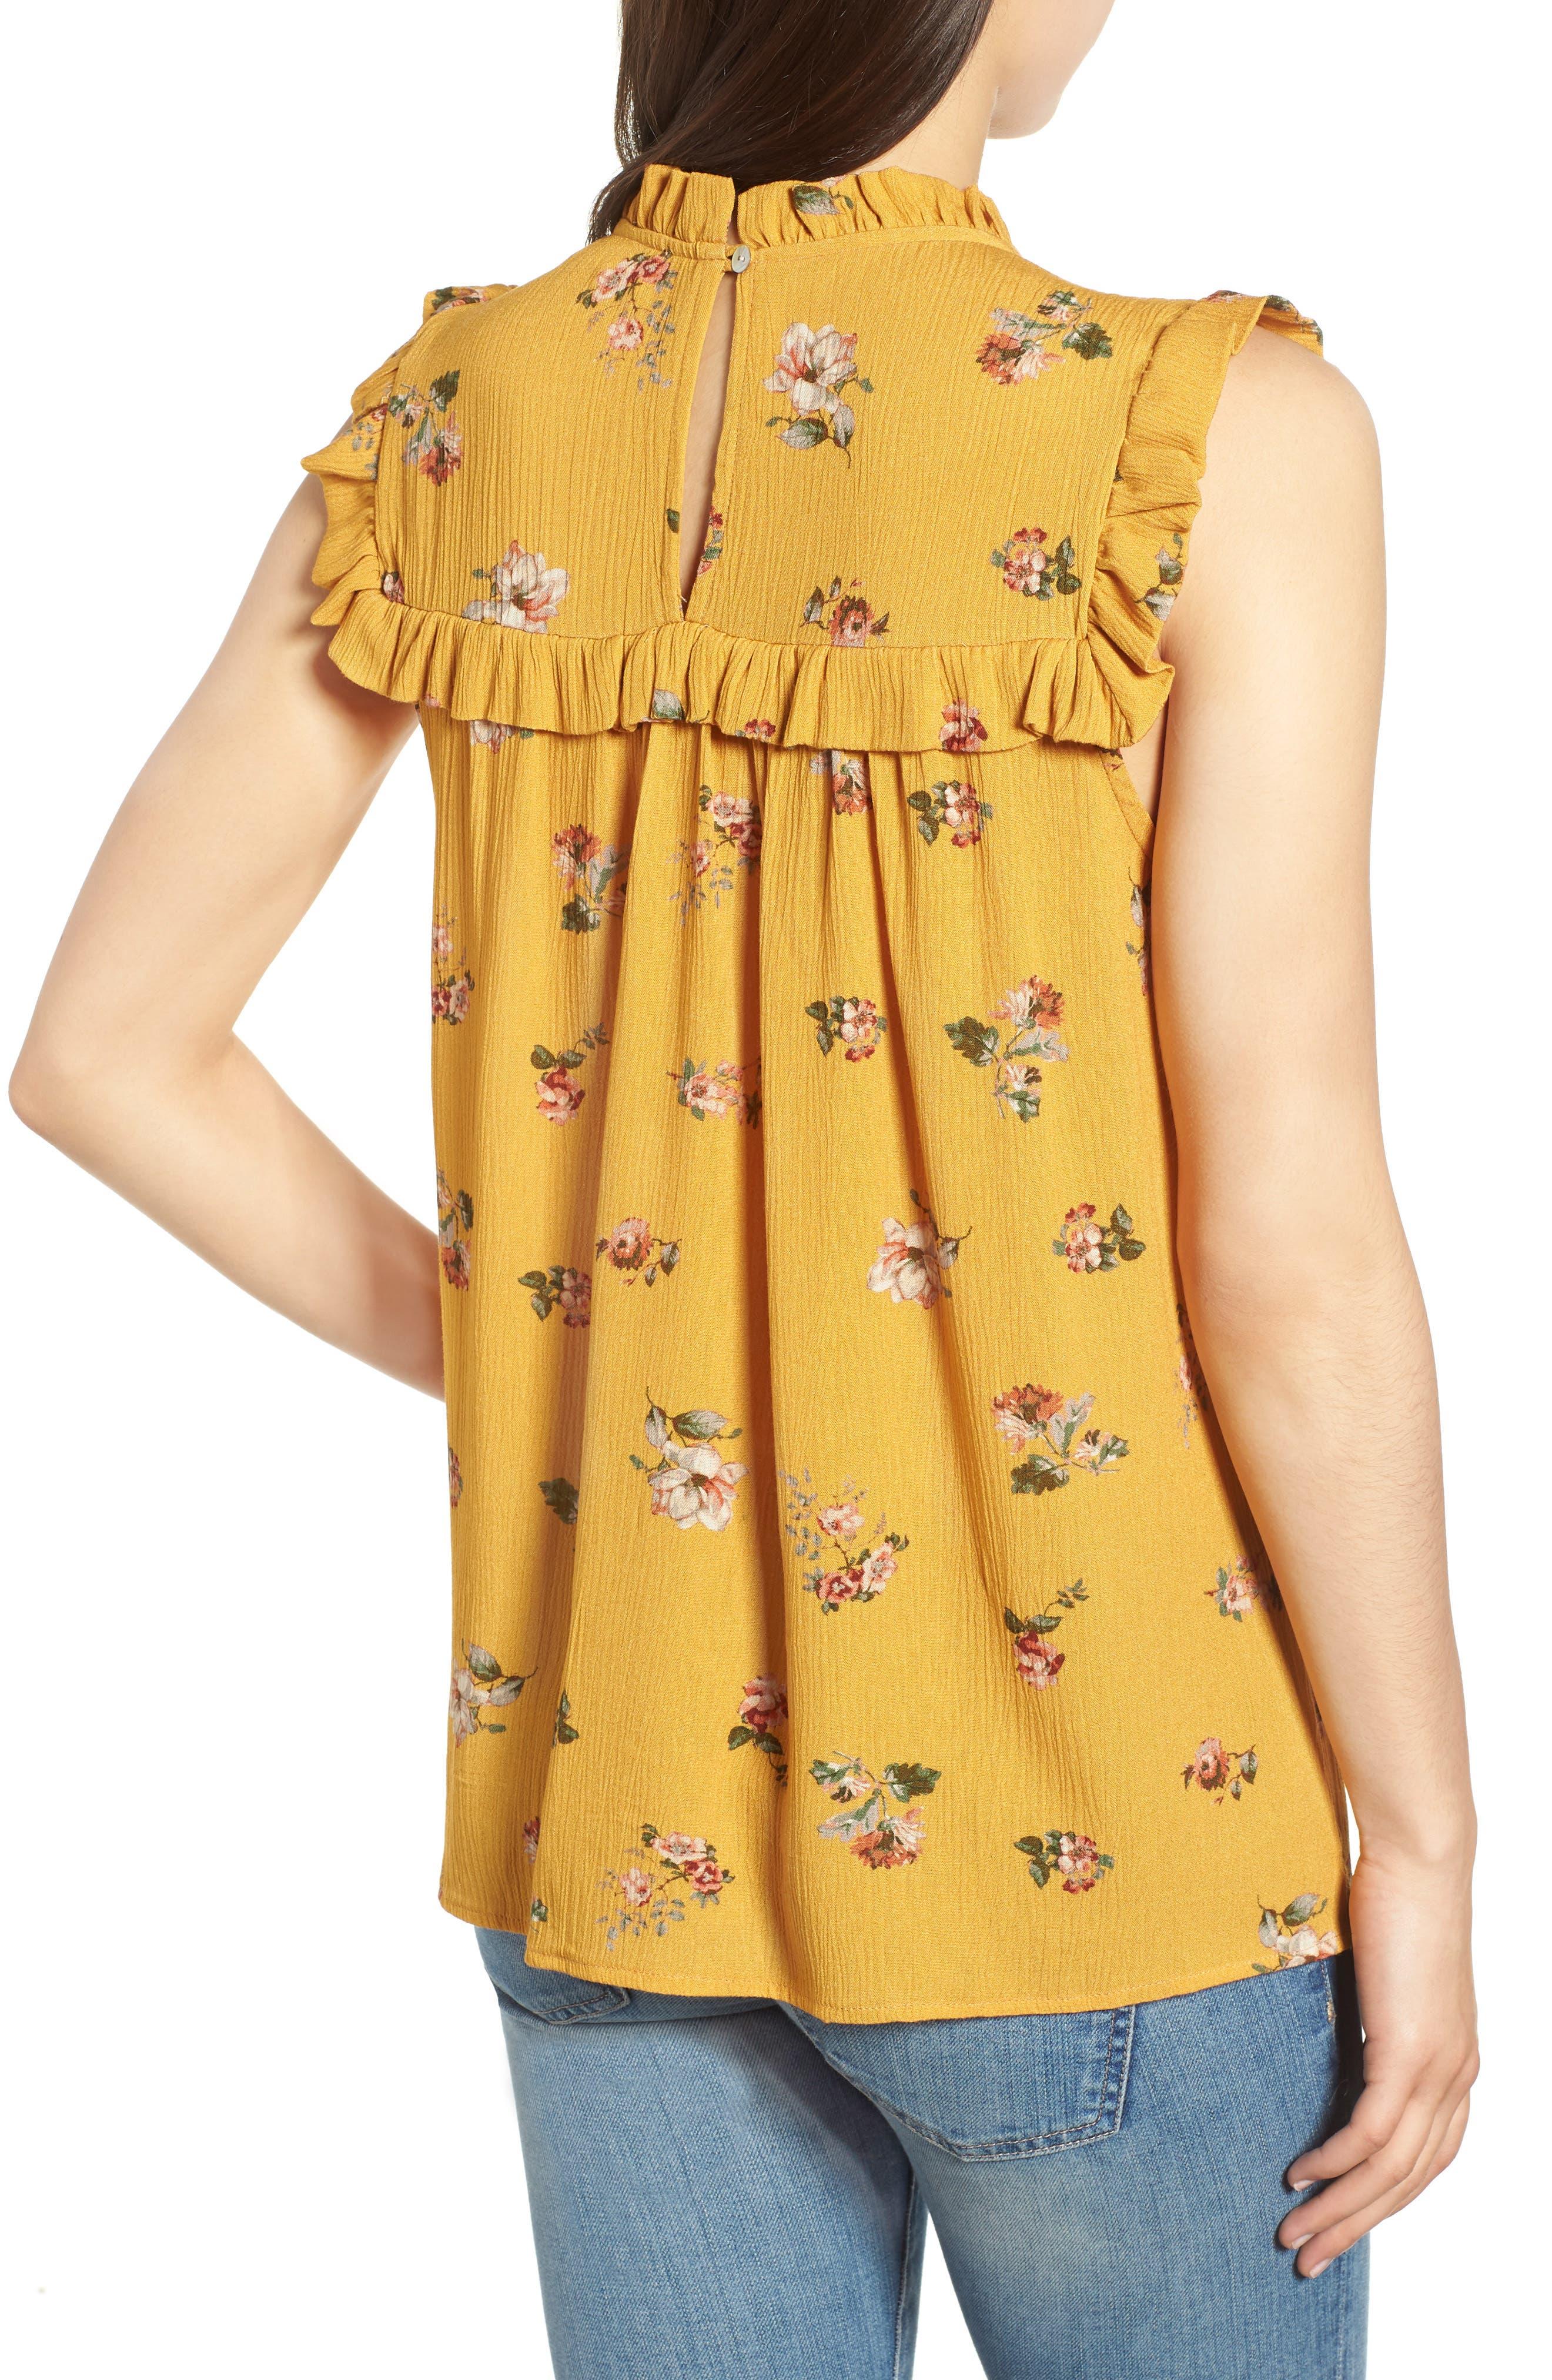 Ruffled Floral Top,                             Alternate thumbnail 2, color,                             Marigold Print